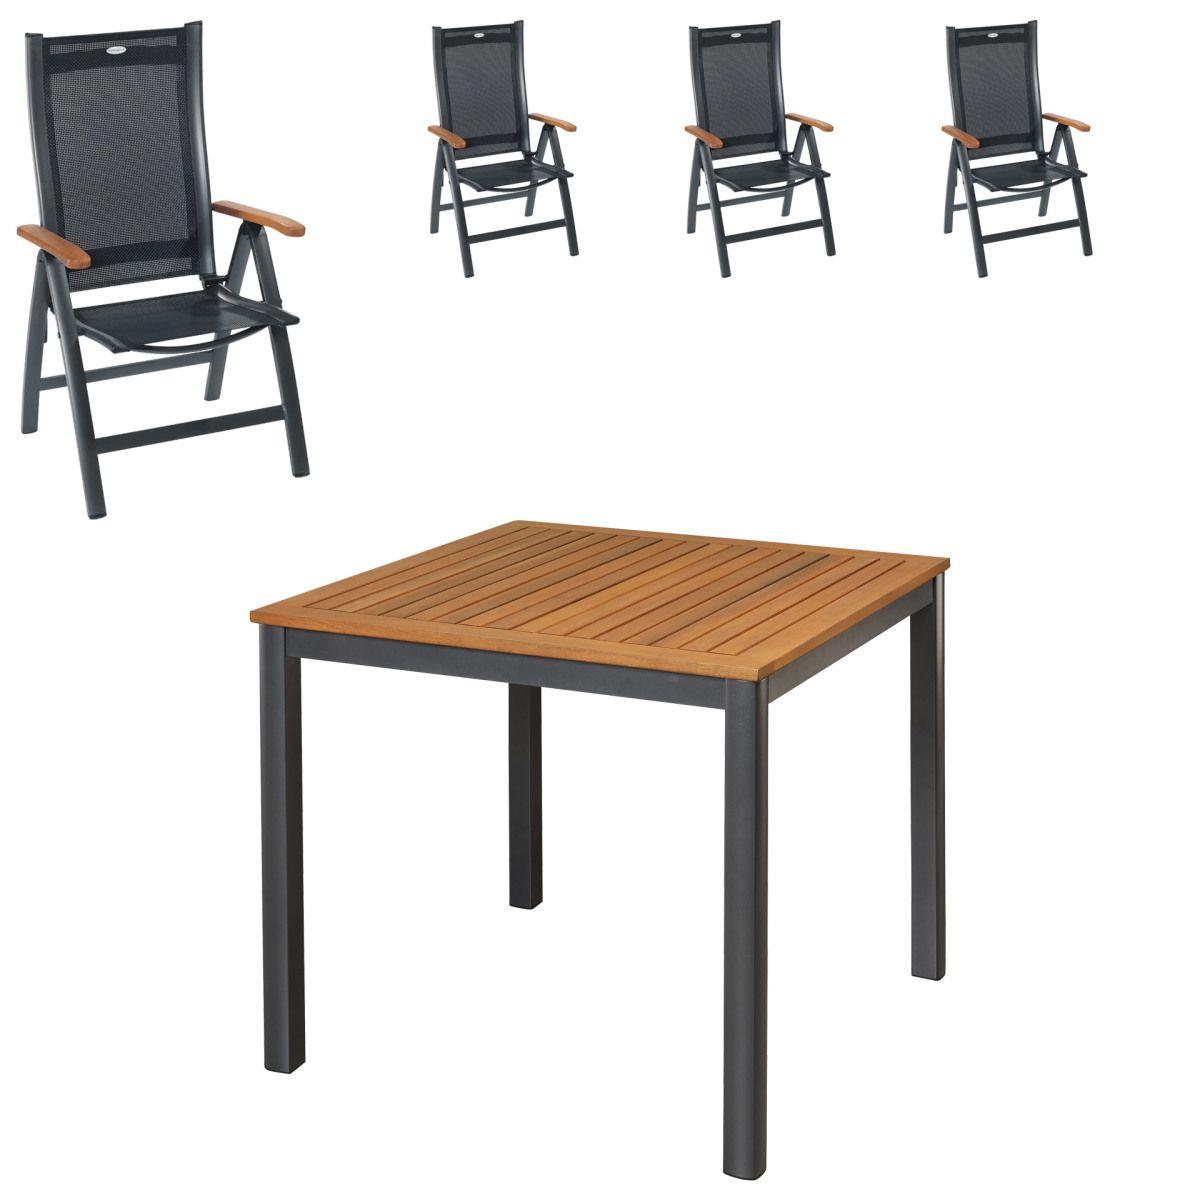 Gartenmöbel Set San Francisco/Sun Garden Prestige (90x90, 4 Stühle